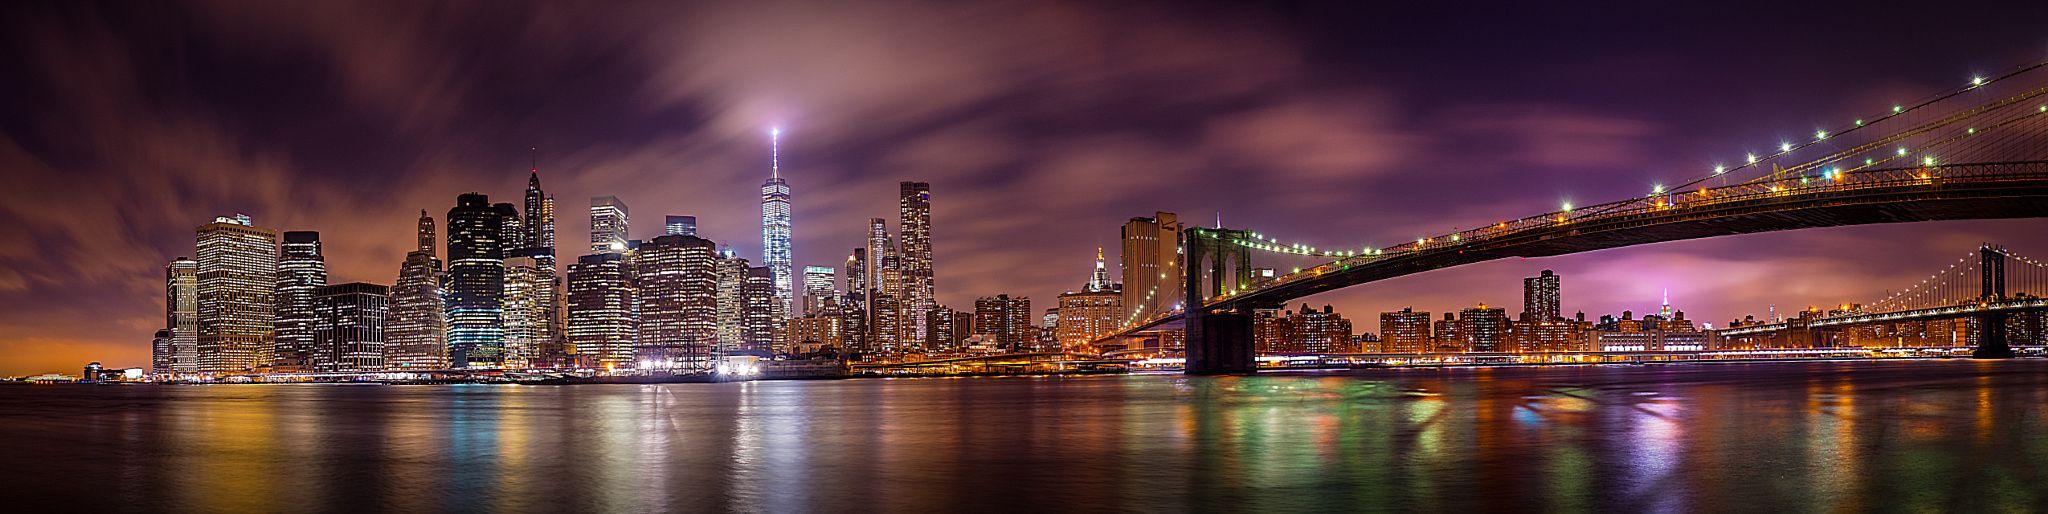 New York City Skyline by night by johanmorin100 - Photo 133871165 - 500px